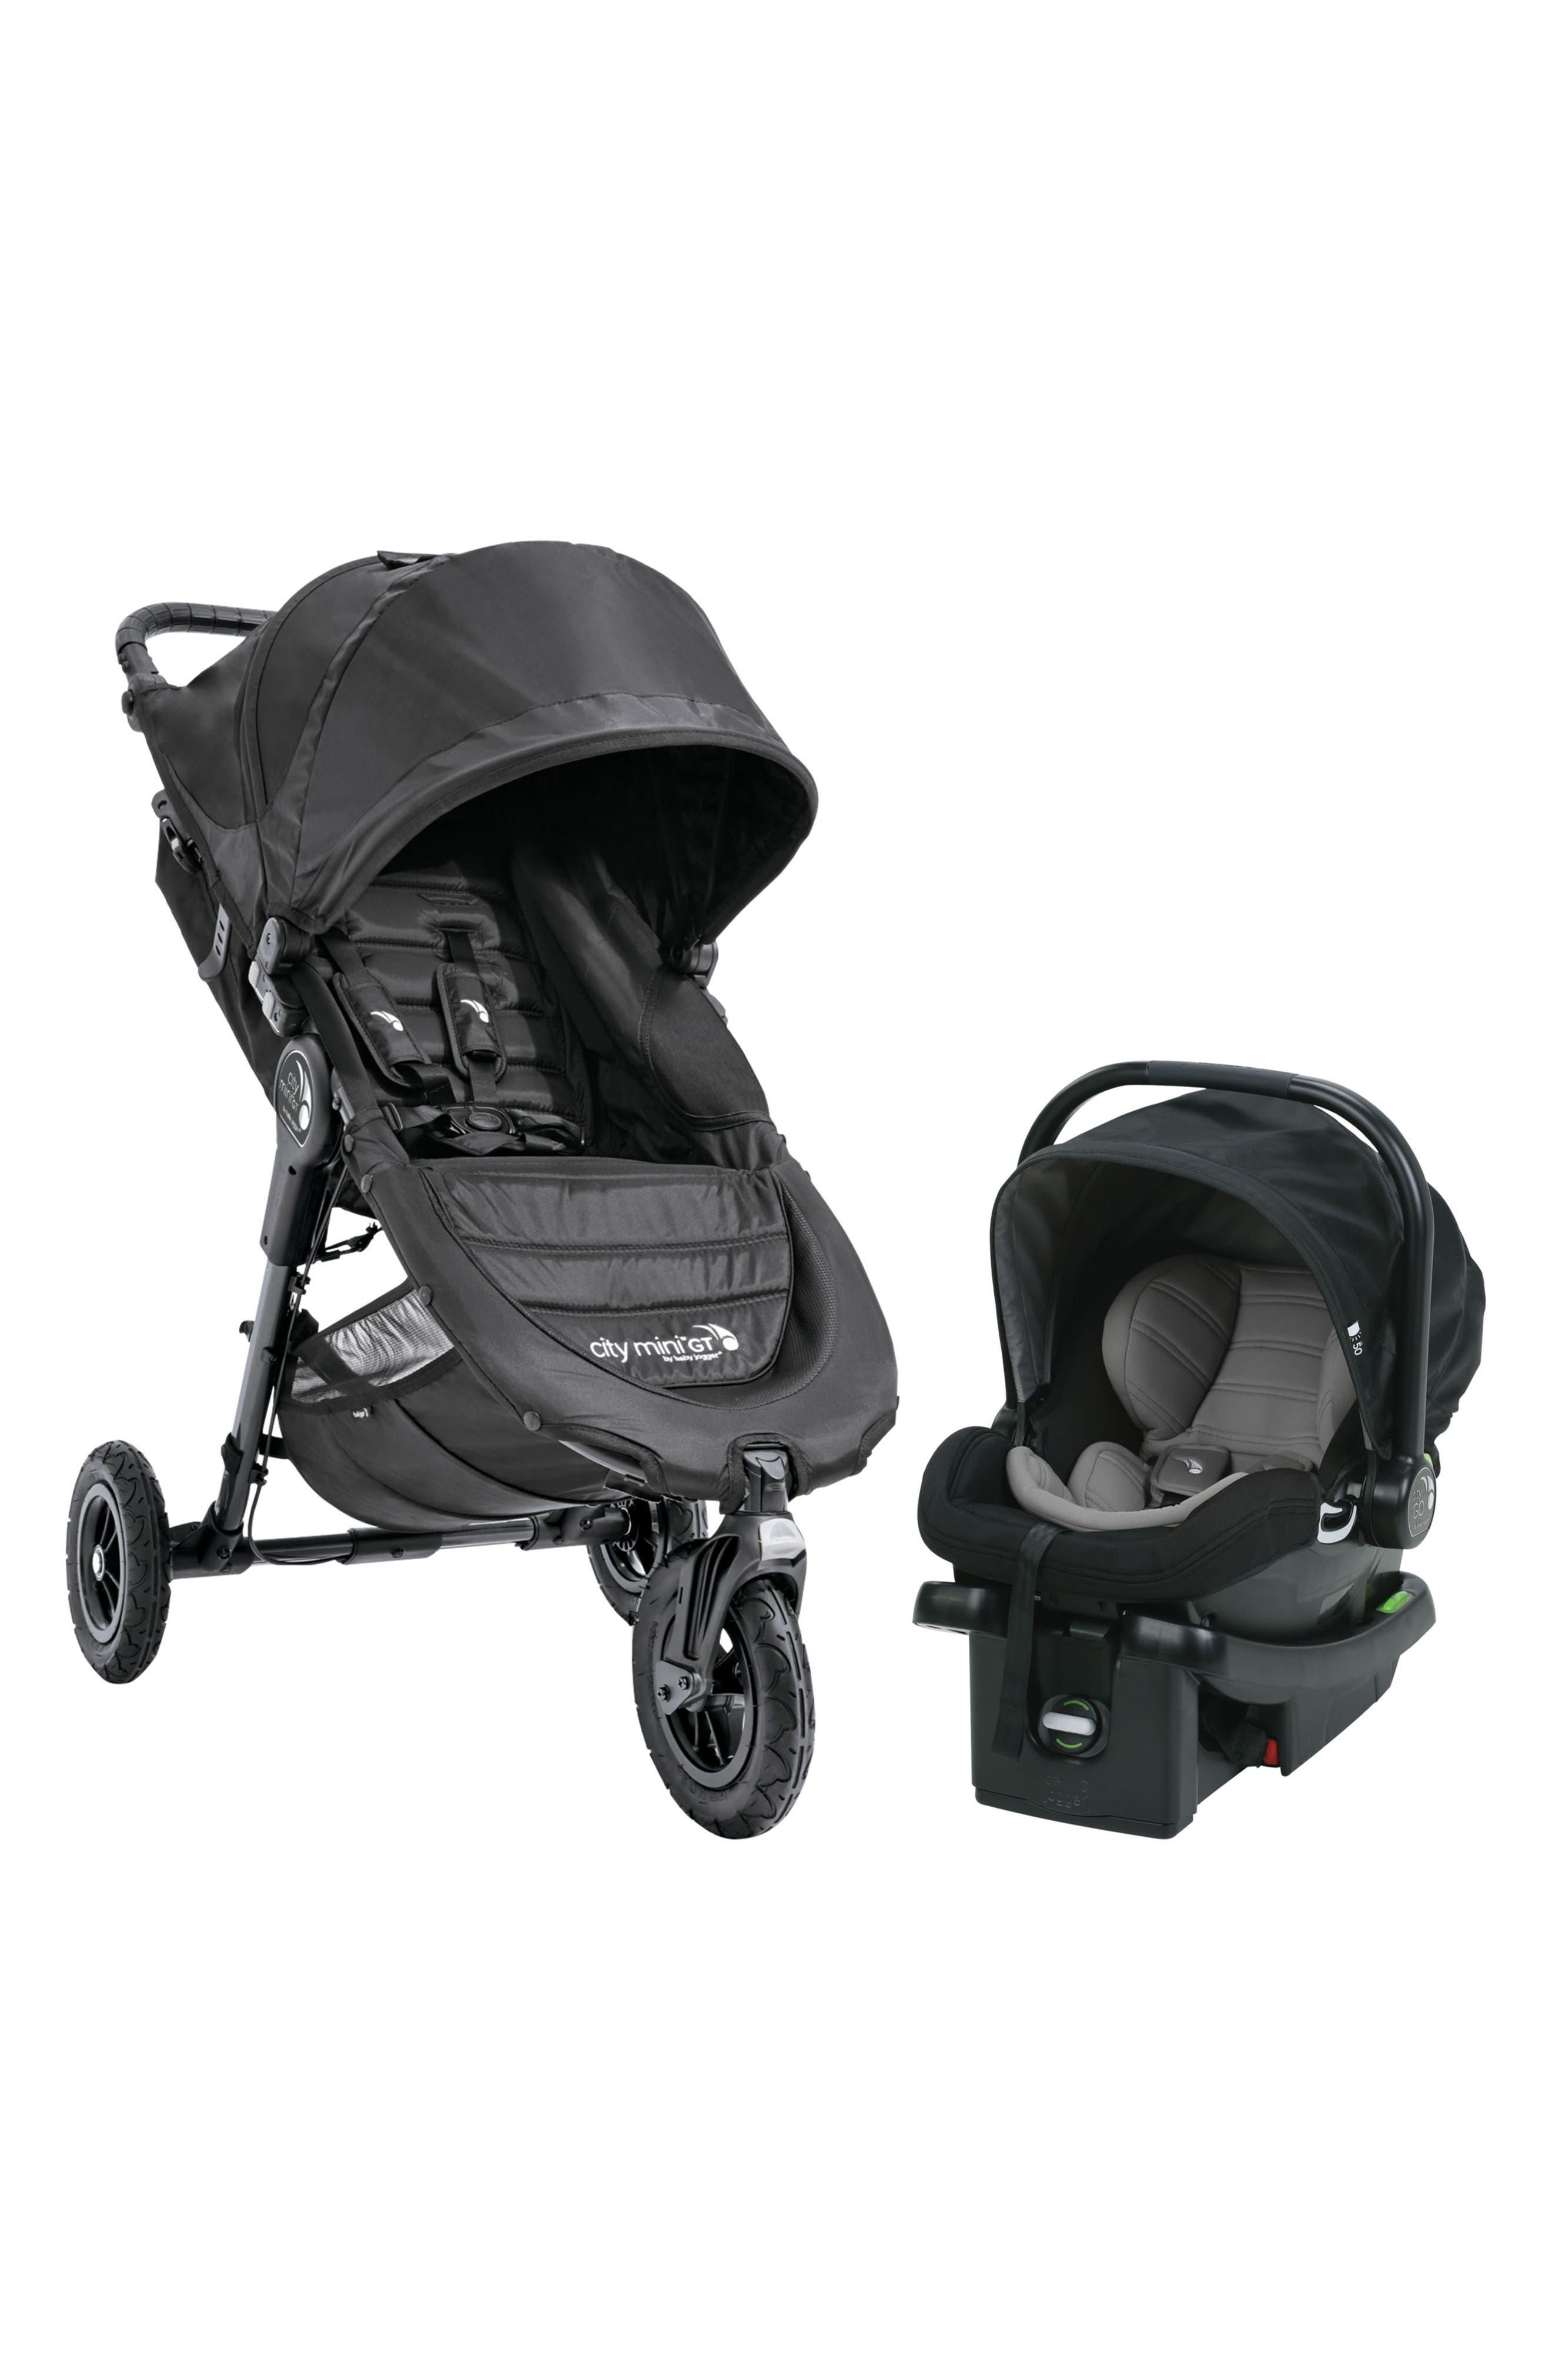 Alternate Image 1 Selected - Baby Jogger City Mini® Stroller & City Go® Infant Car Seat Travel System